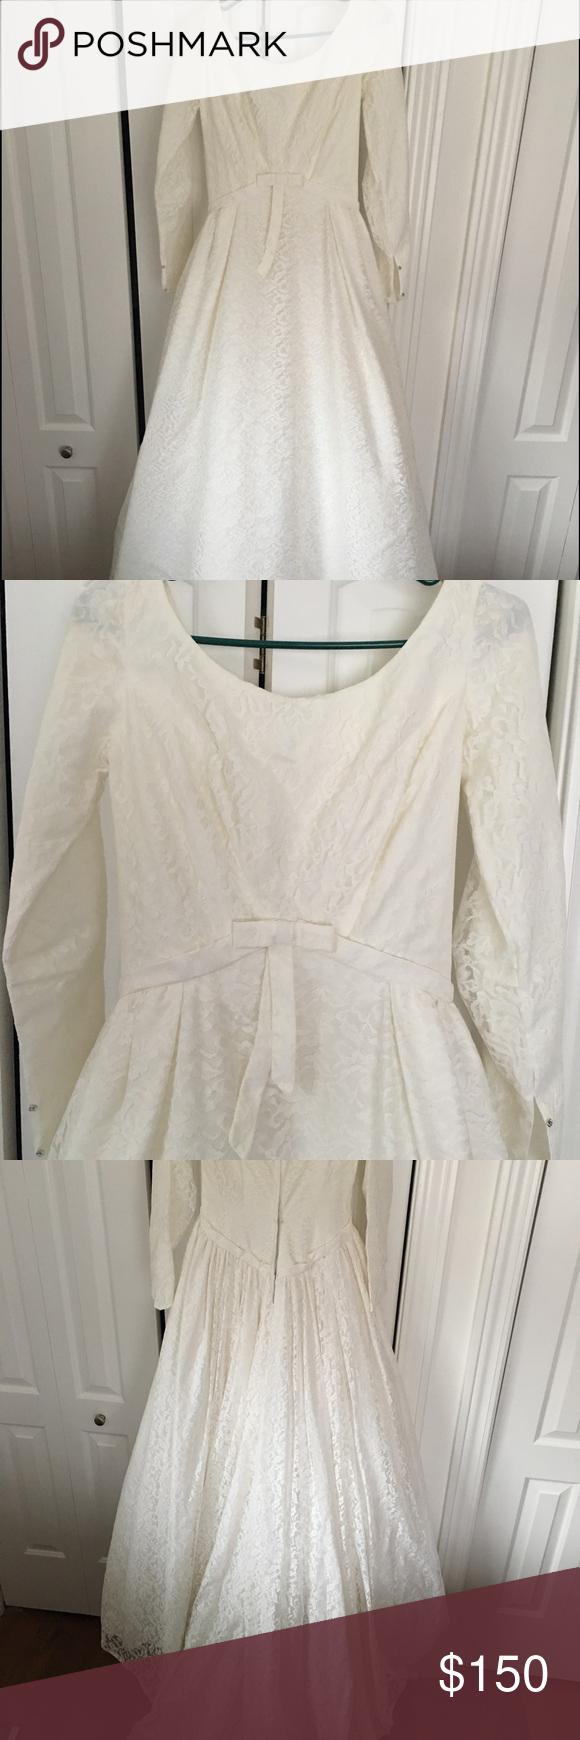 60s lace wedding dress  Beautiful usus wedding dress  Beautiful wedding dress